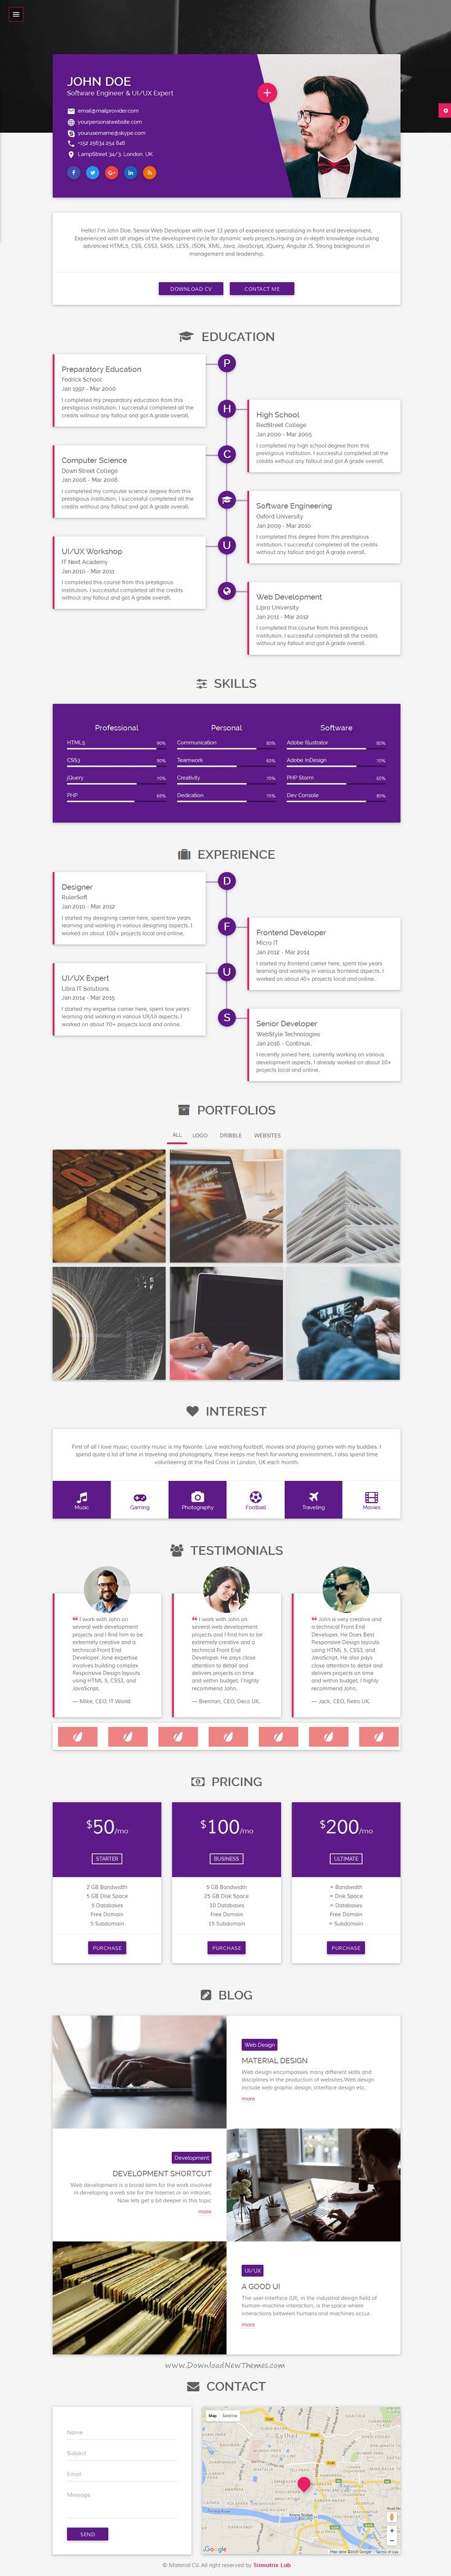 Flatrica Material Cv Resume Online Resume Material Design And